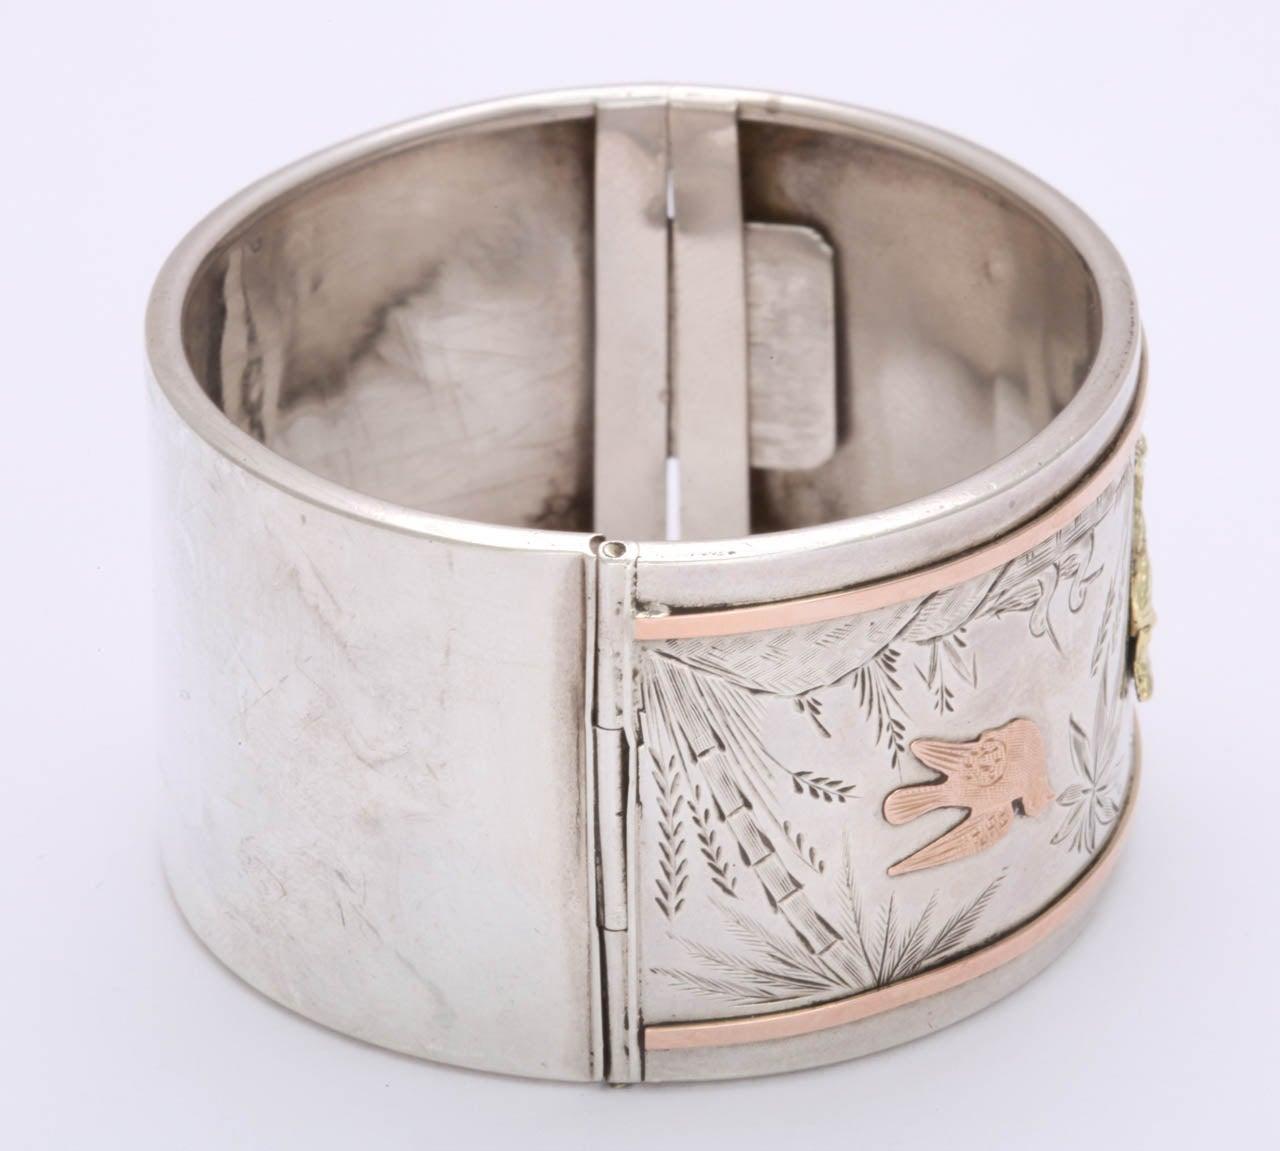 Spring Awakening:  A Victorian Cuff Bracelet 6